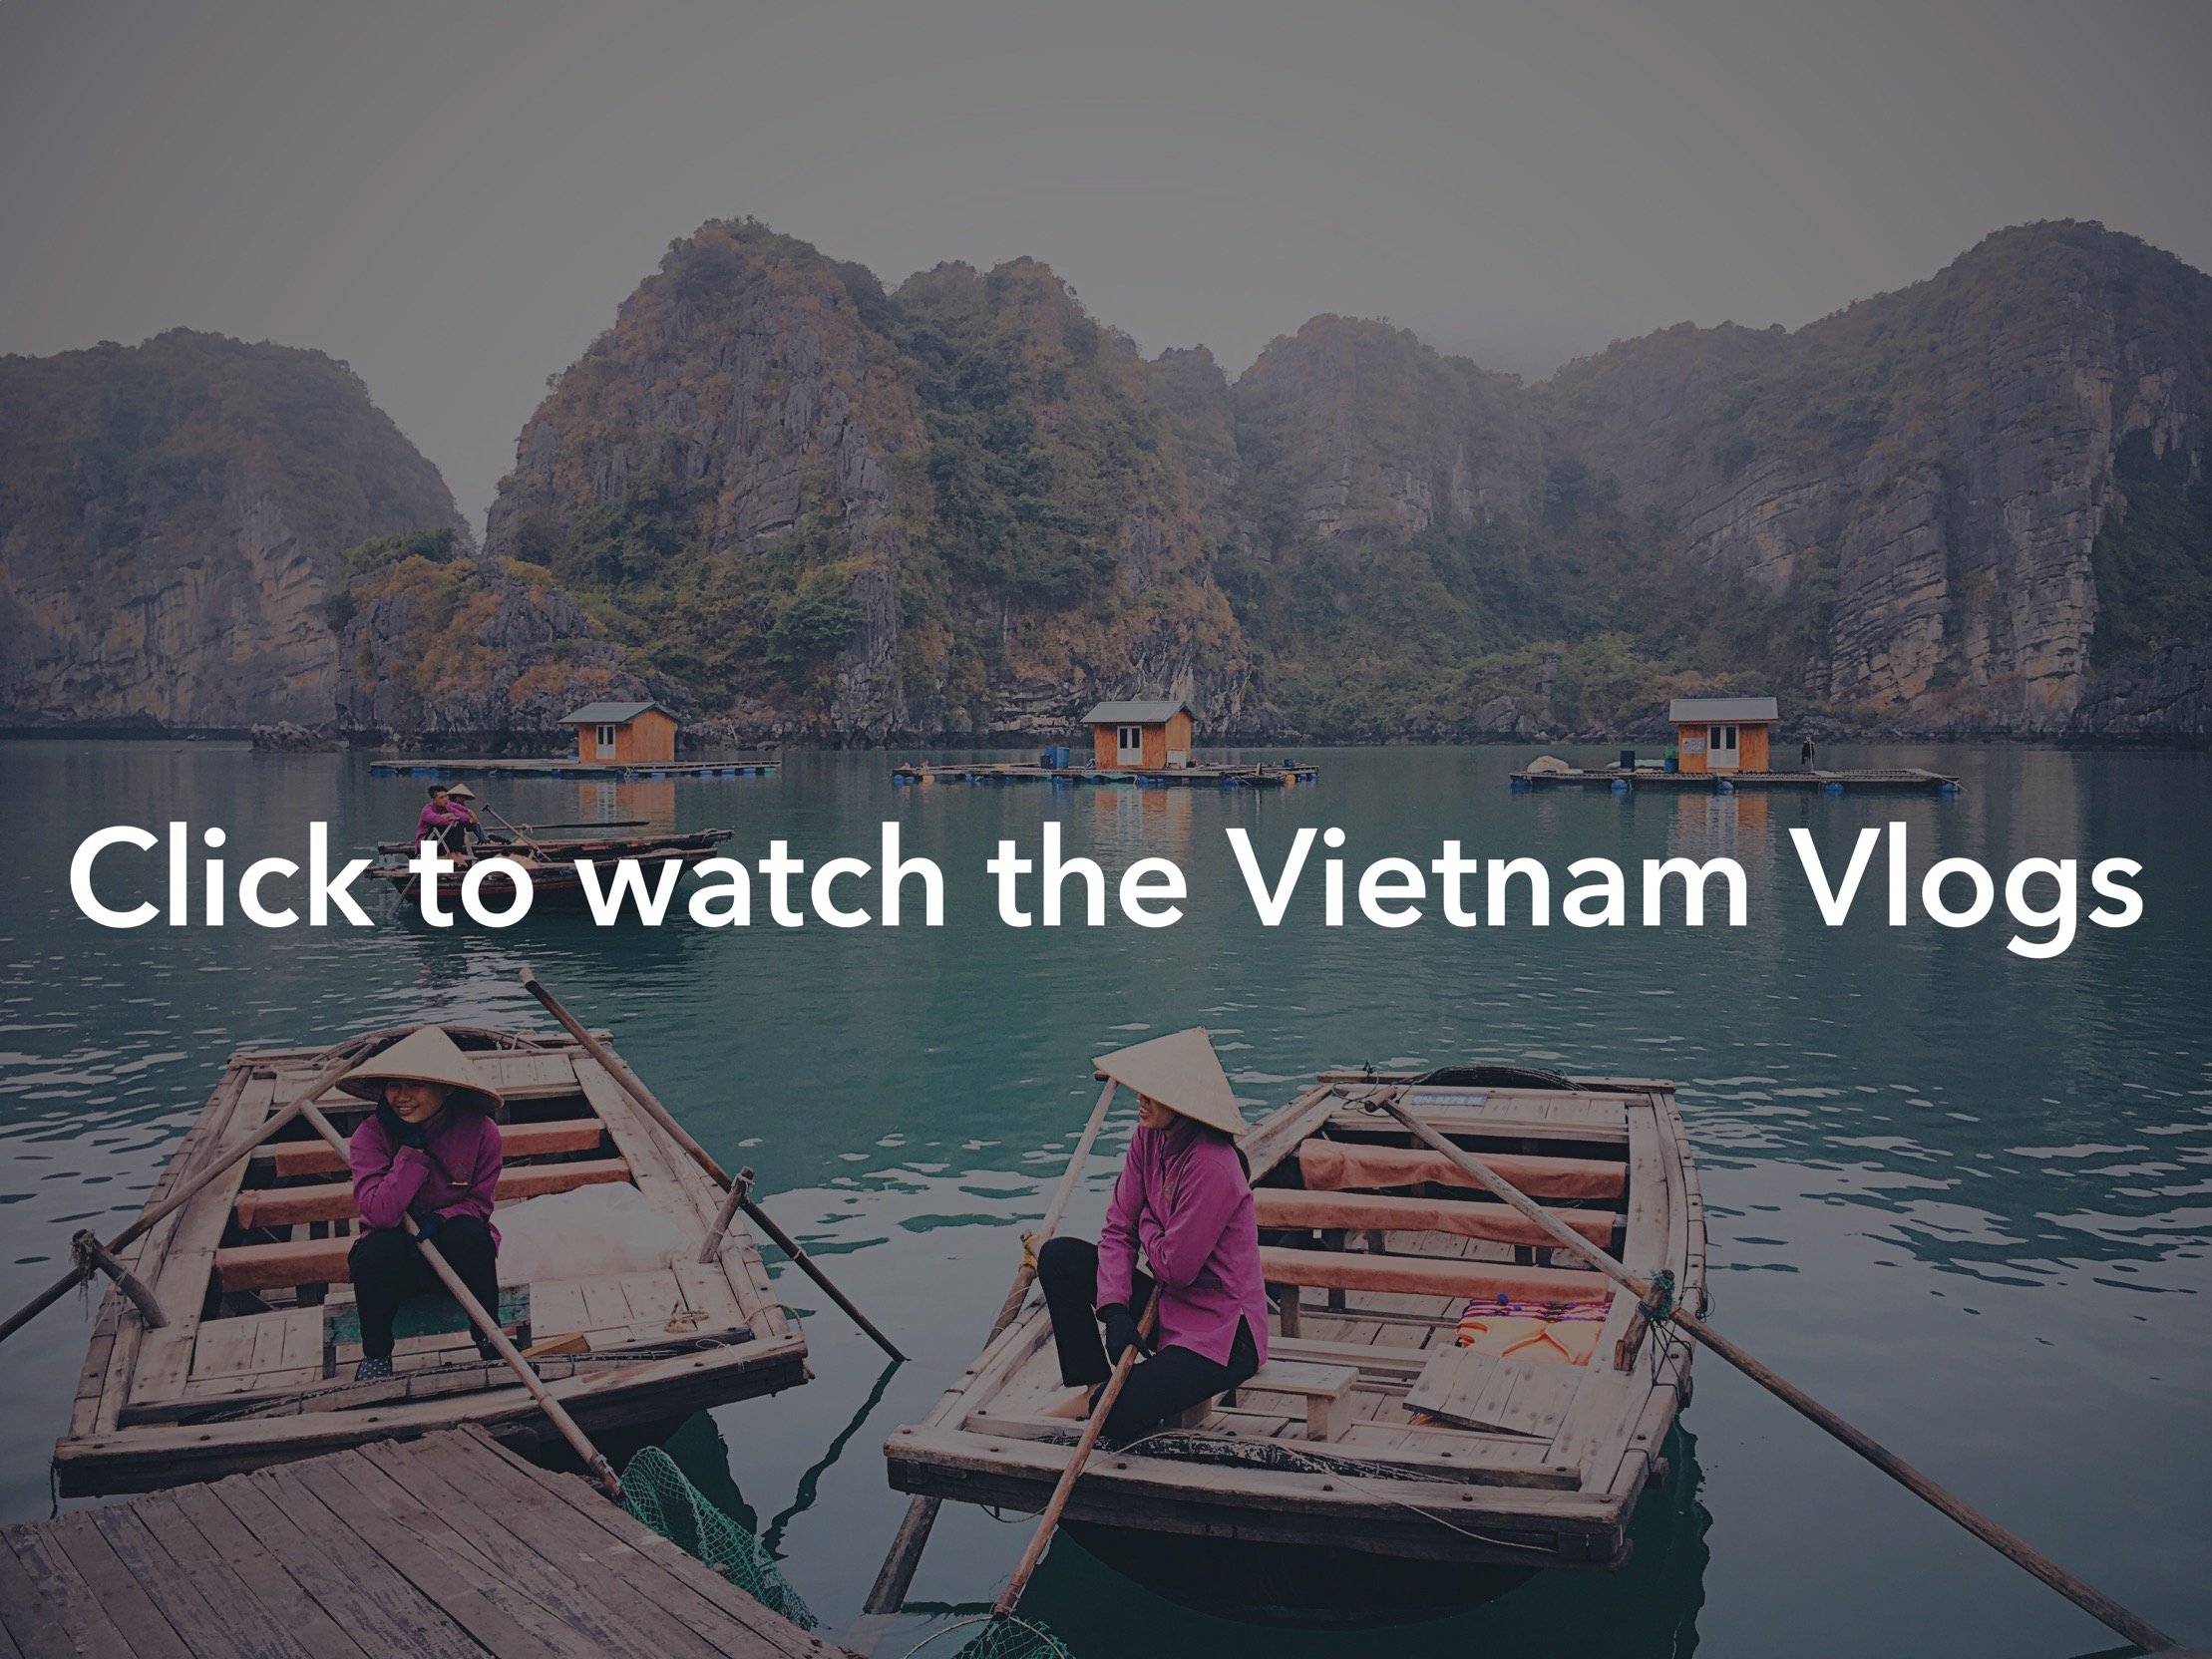 vietnam vlogs 15.15.11.jpg